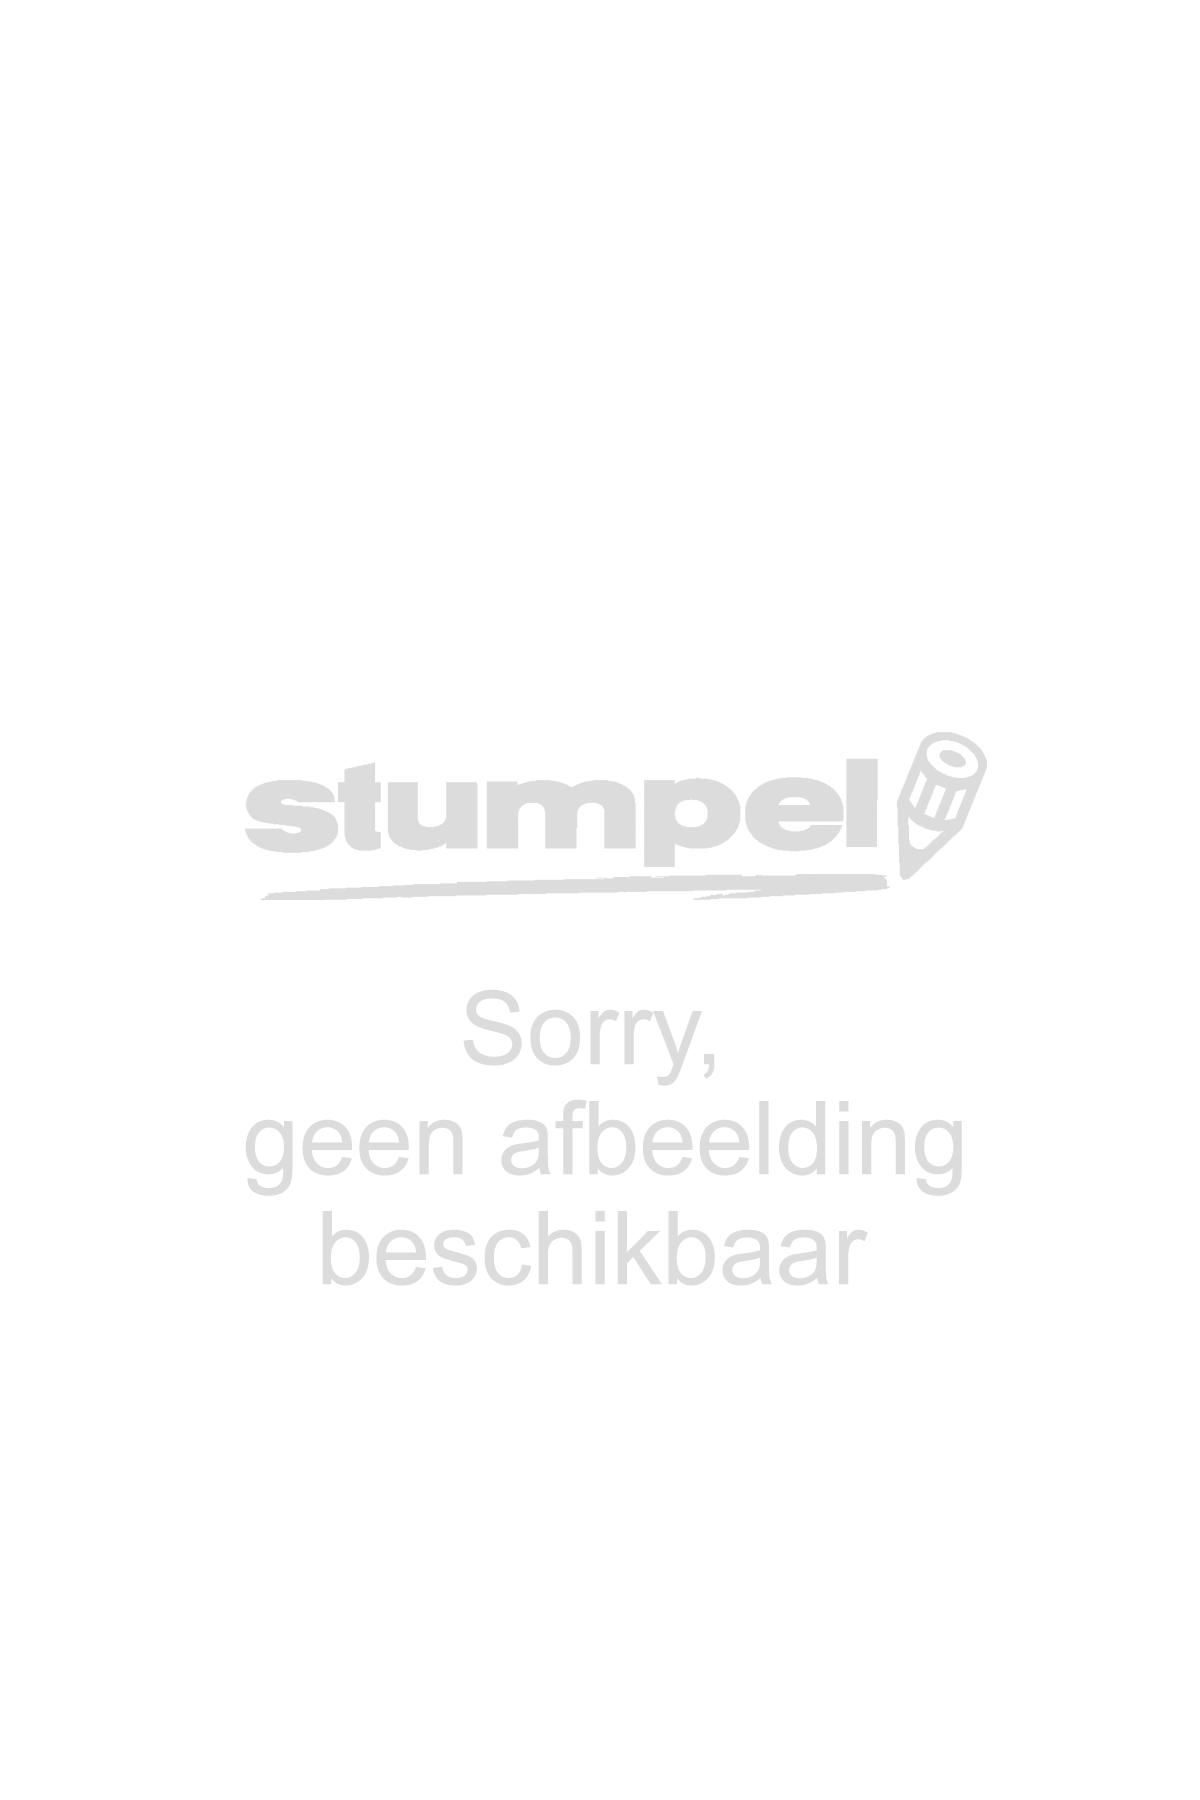 agenda-2021-ryam-inhoud-memoplan-7-ringplastic-crème-6-talig-11011022